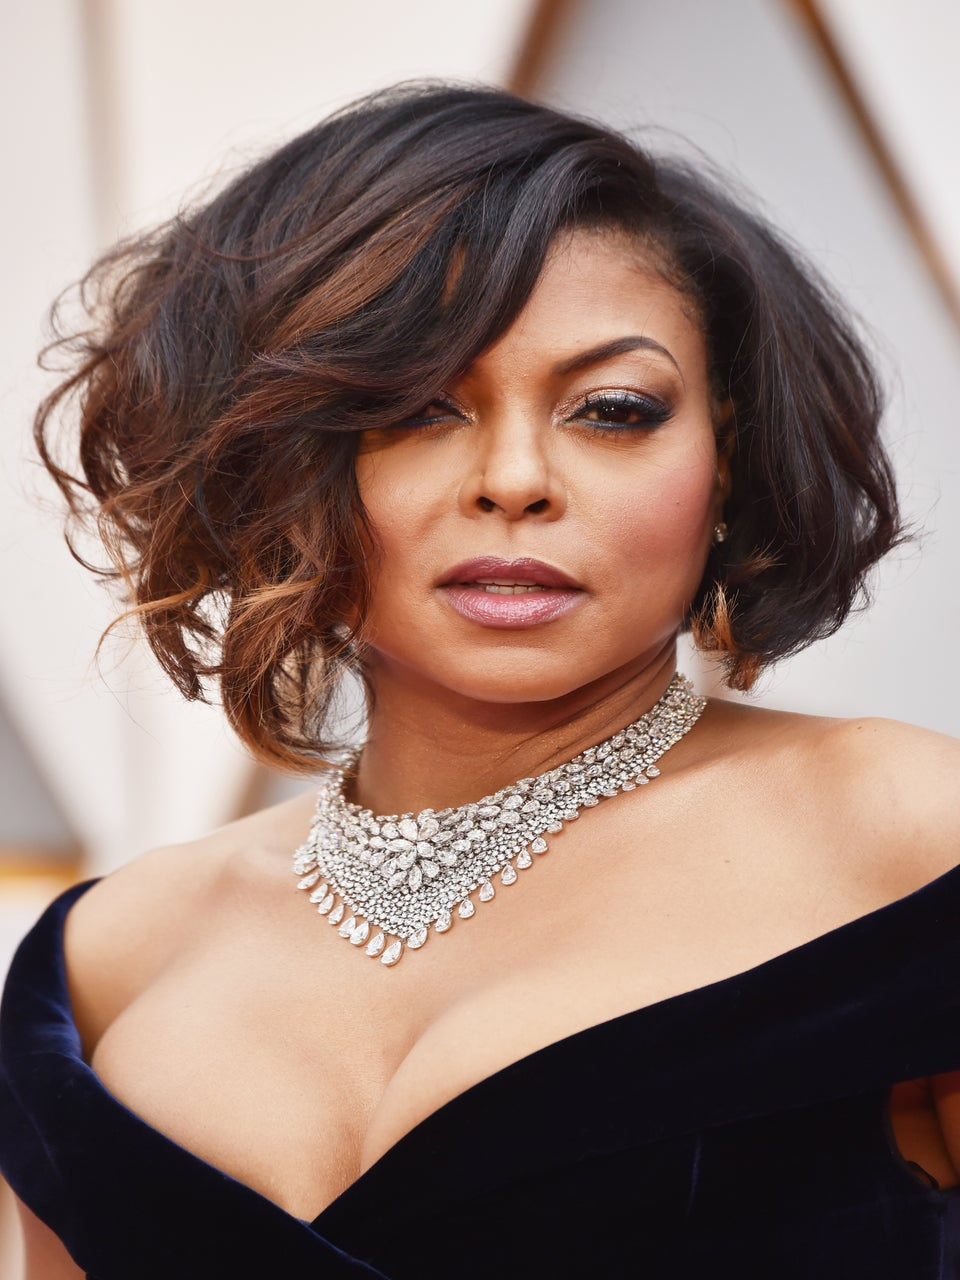 Taraji P. Henson Delivers Old Hollywood Glam on 2017 Oscars Red Carpet